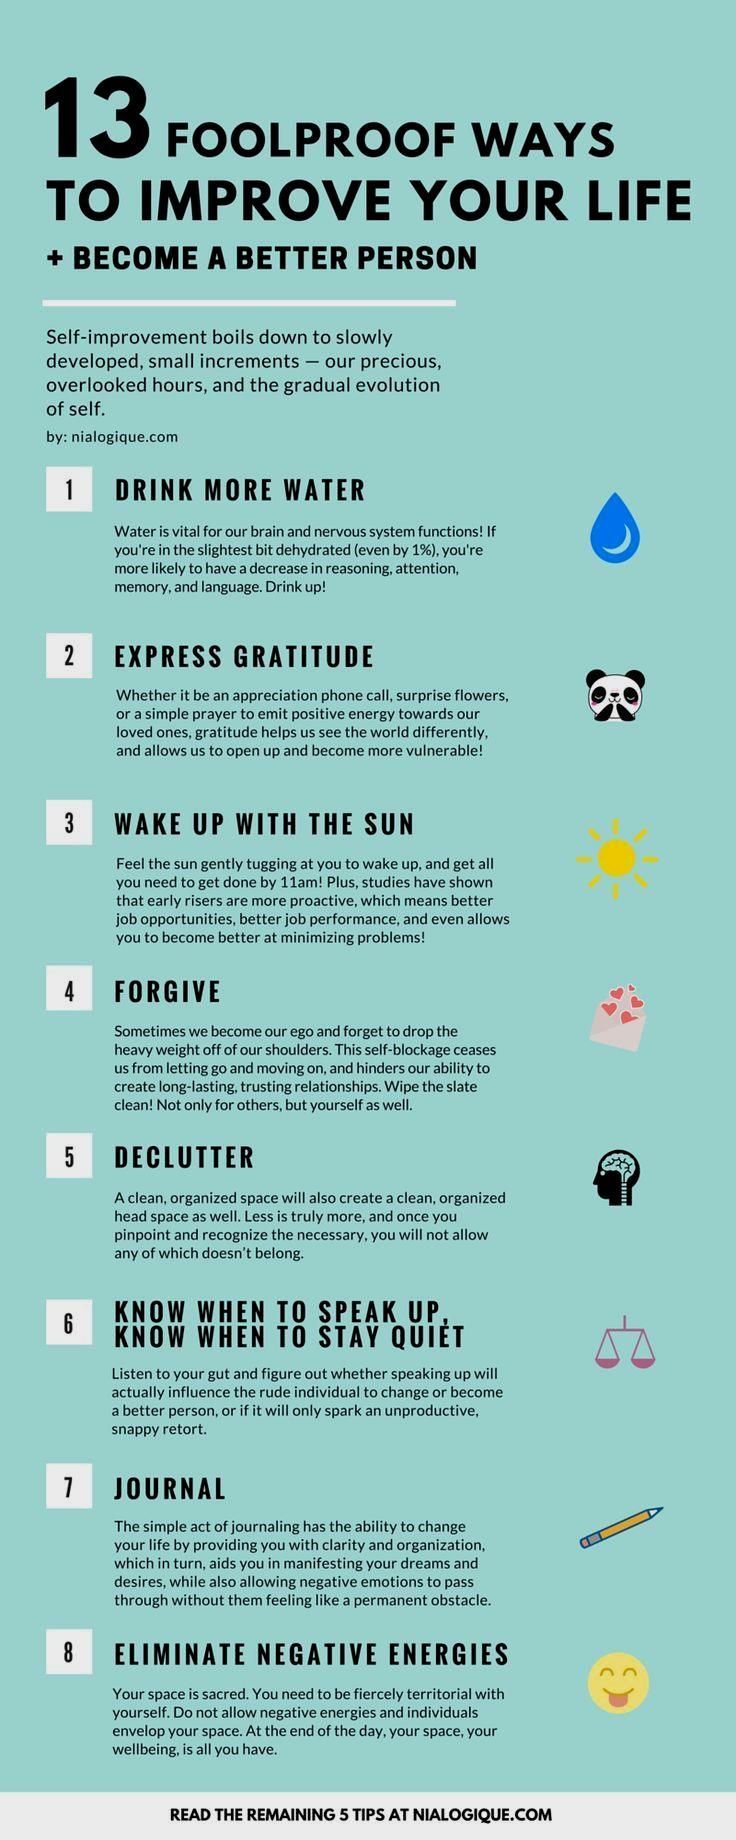 13 ways to improve your life